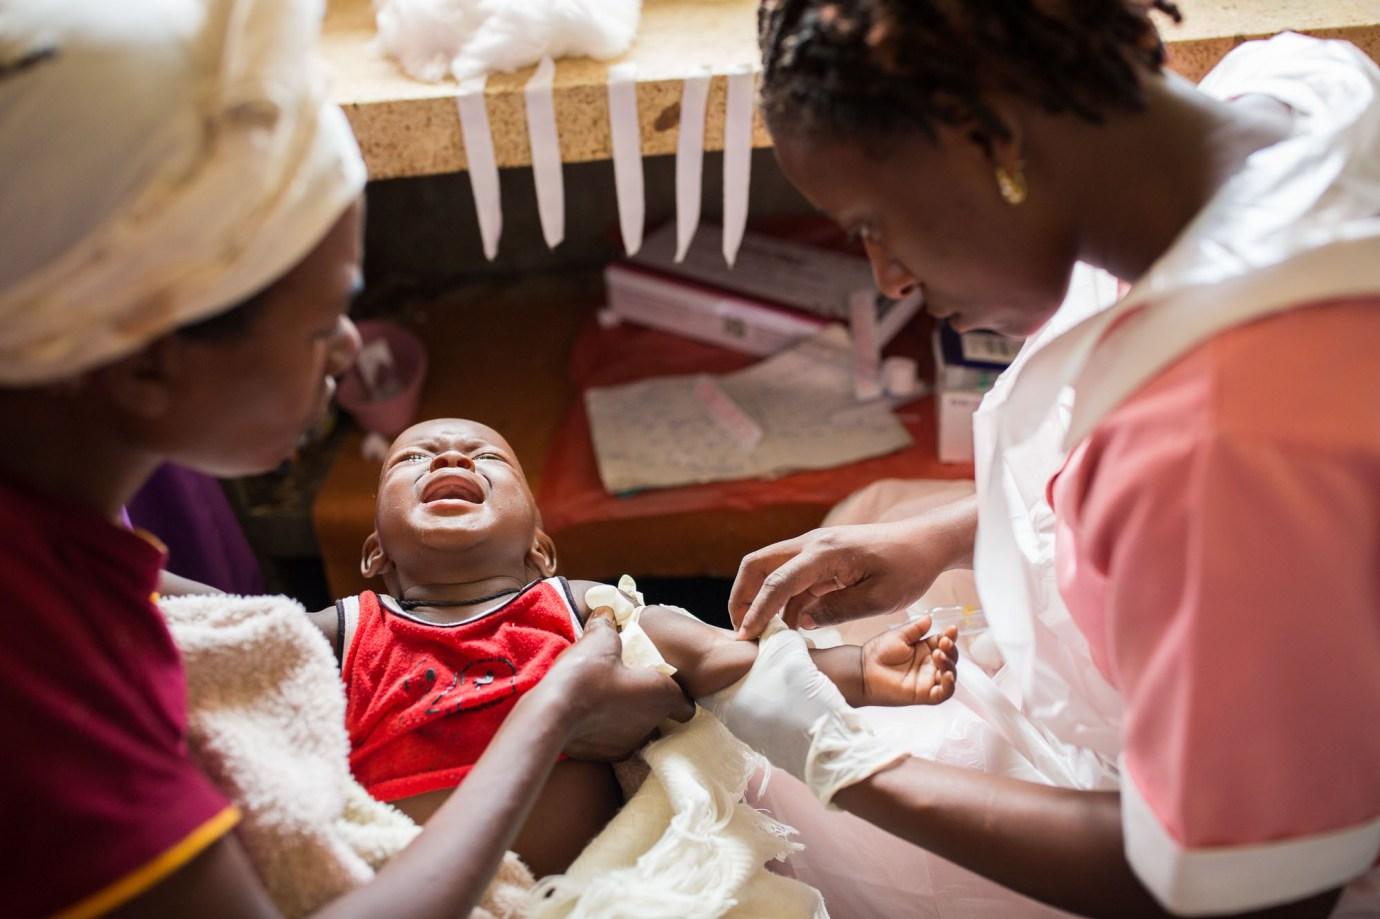 Seven-month-old Jjuma is treated for malaria at an underserved hospital in Bundibugyo, Uganda.